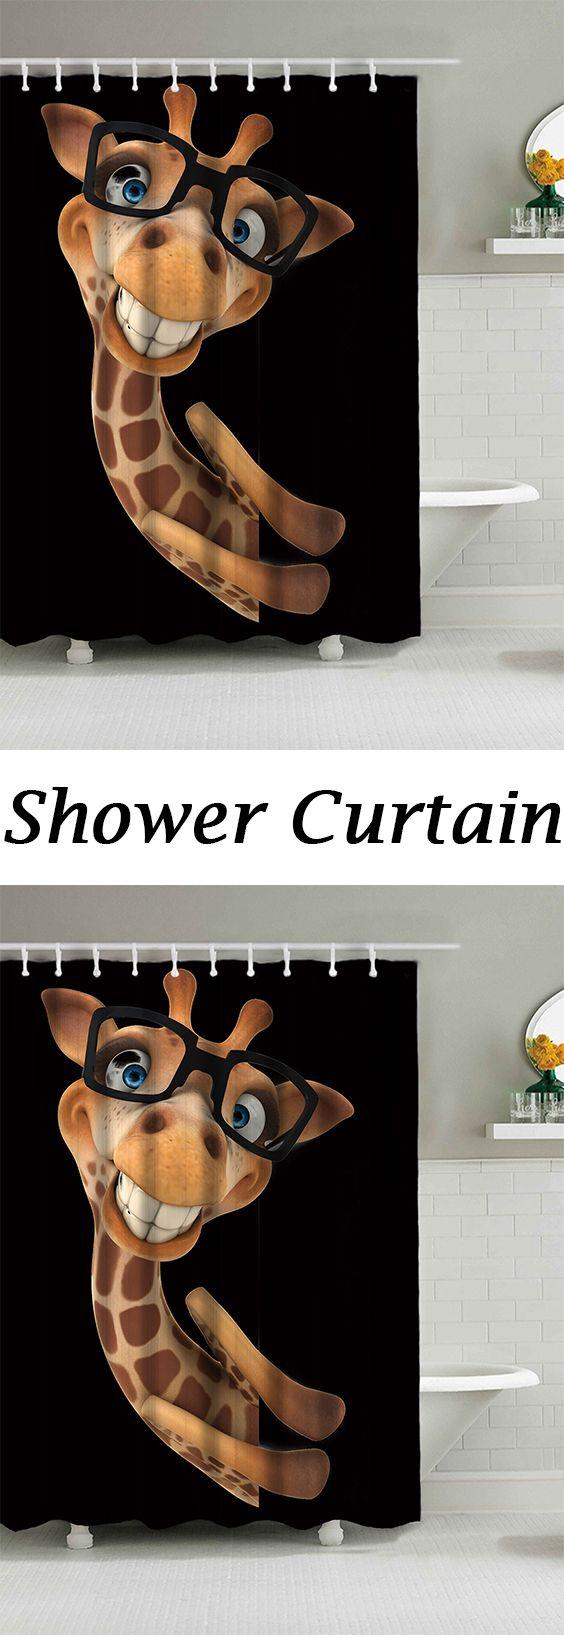 Wear Glasses Smile Giraffe Waterproof Fabric Shower Curtain